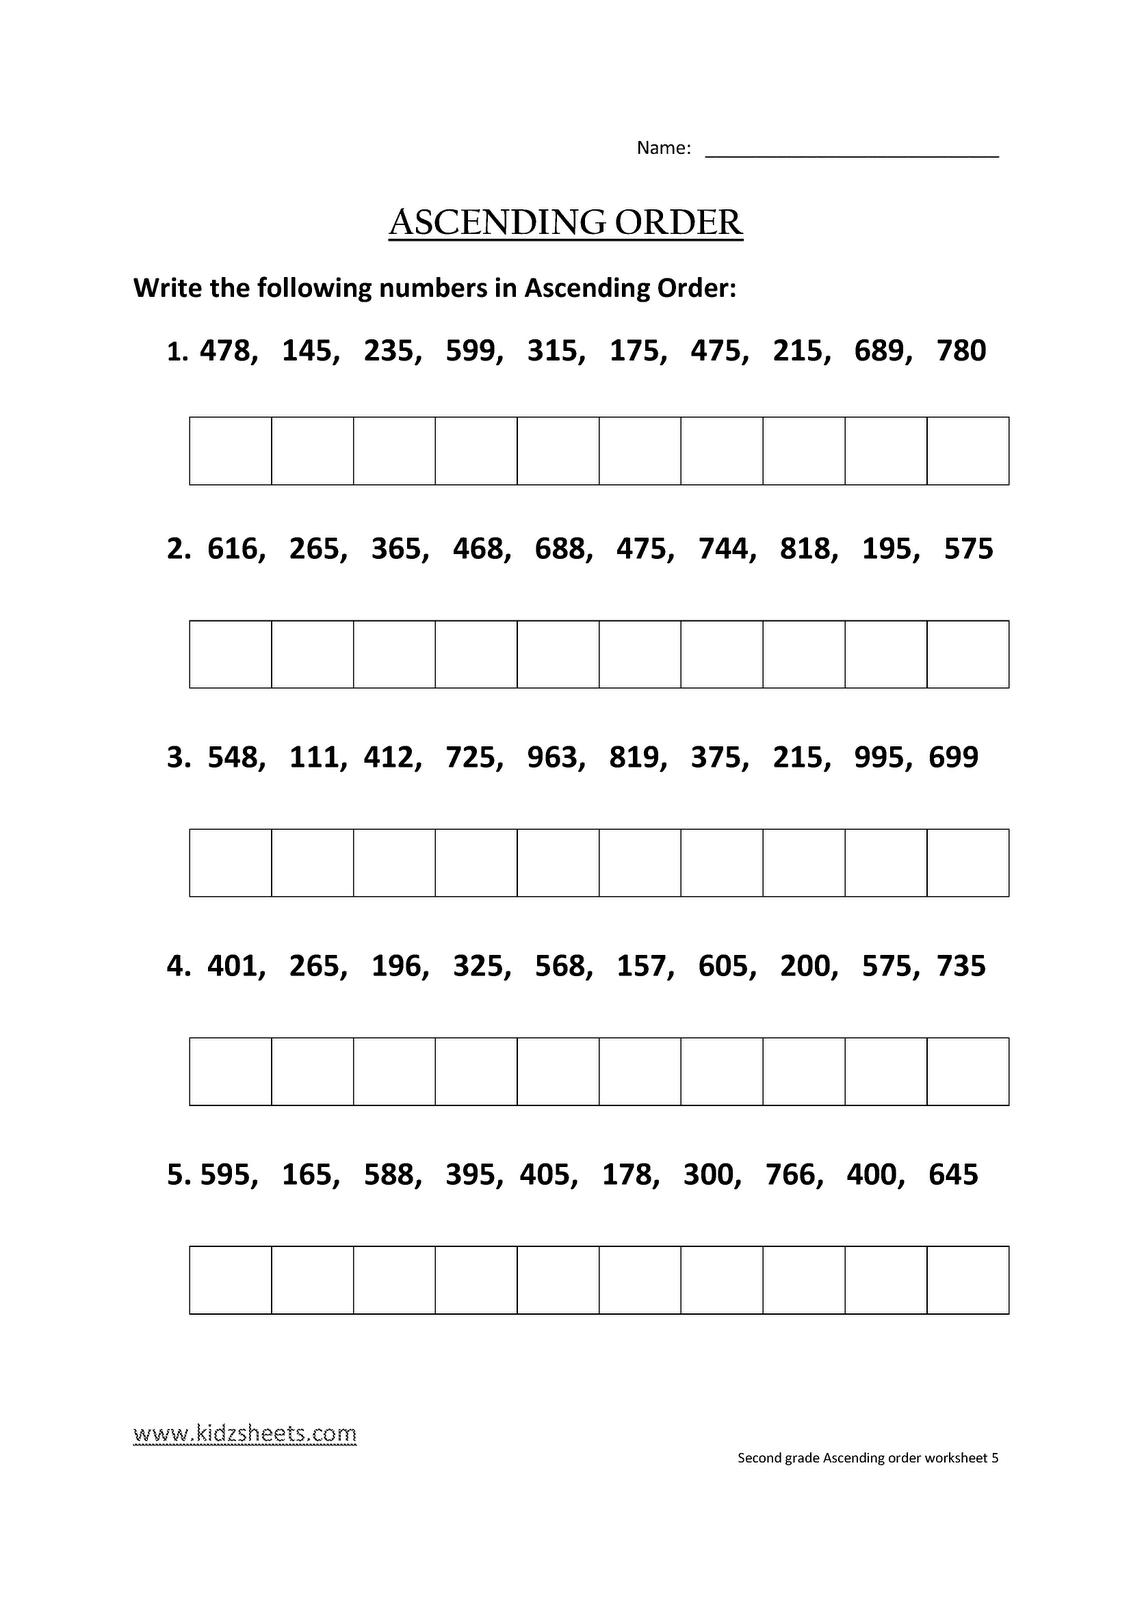 Kindergarten Math Ascending Order Worksheets - Preschool Worksheet Gallery [ 1600 x 1131 Pixel ]